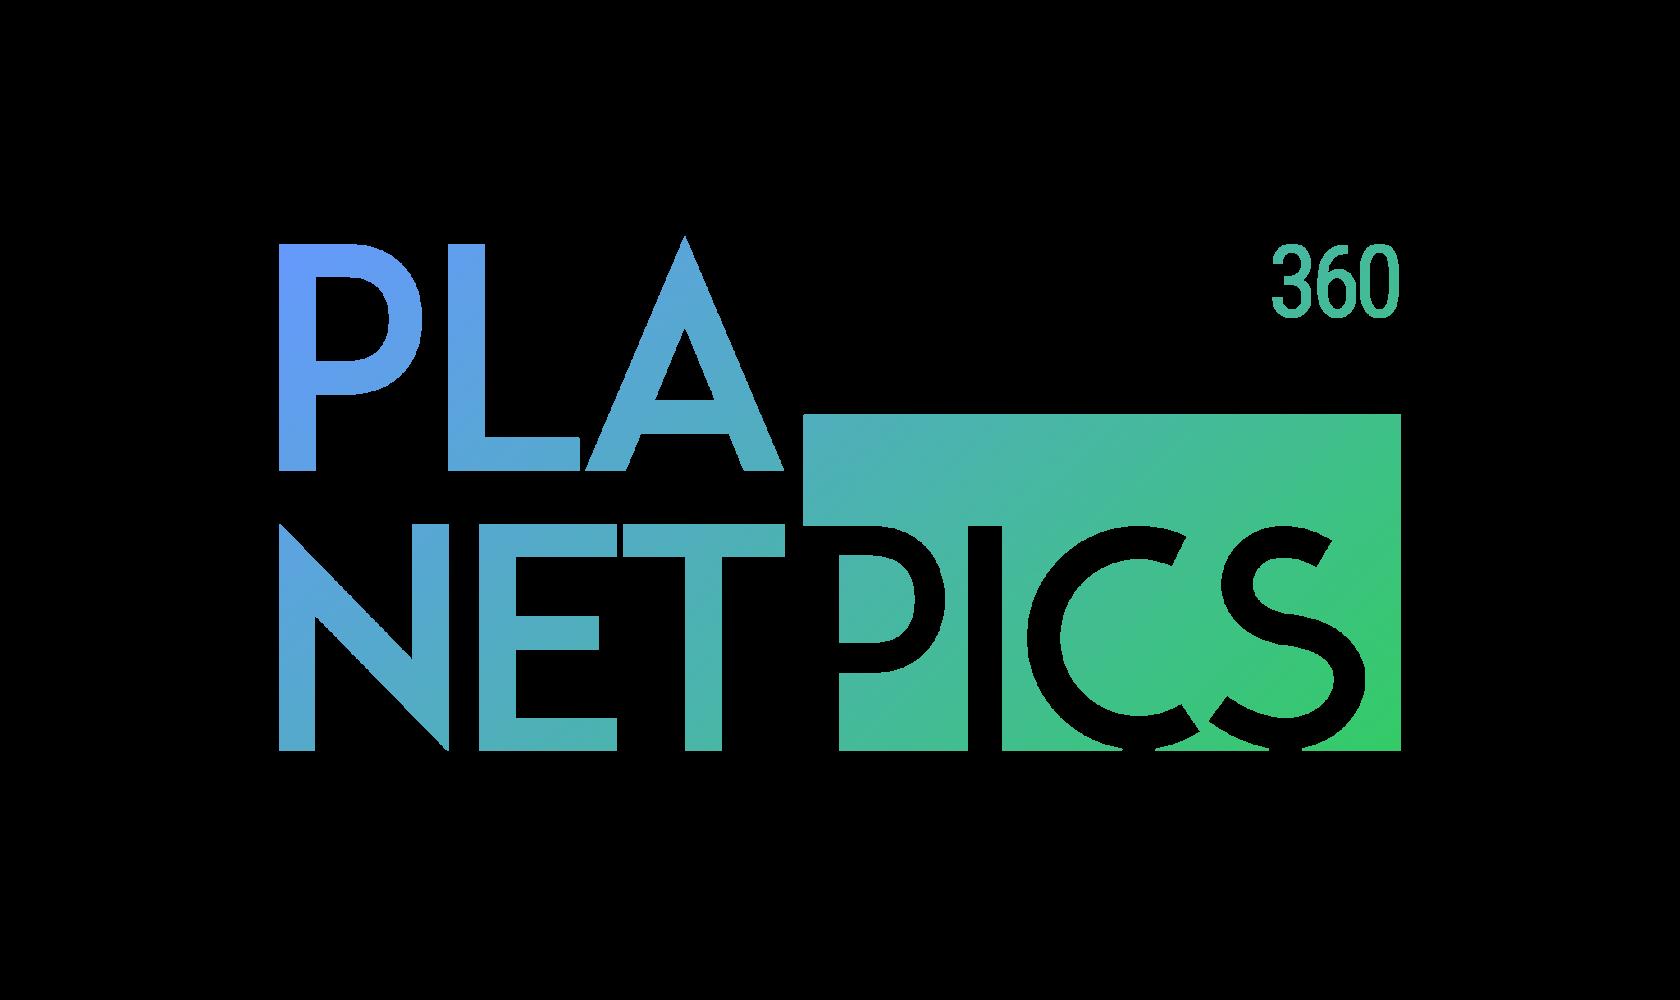 Planetpics 360-видео VR-кинотеатр